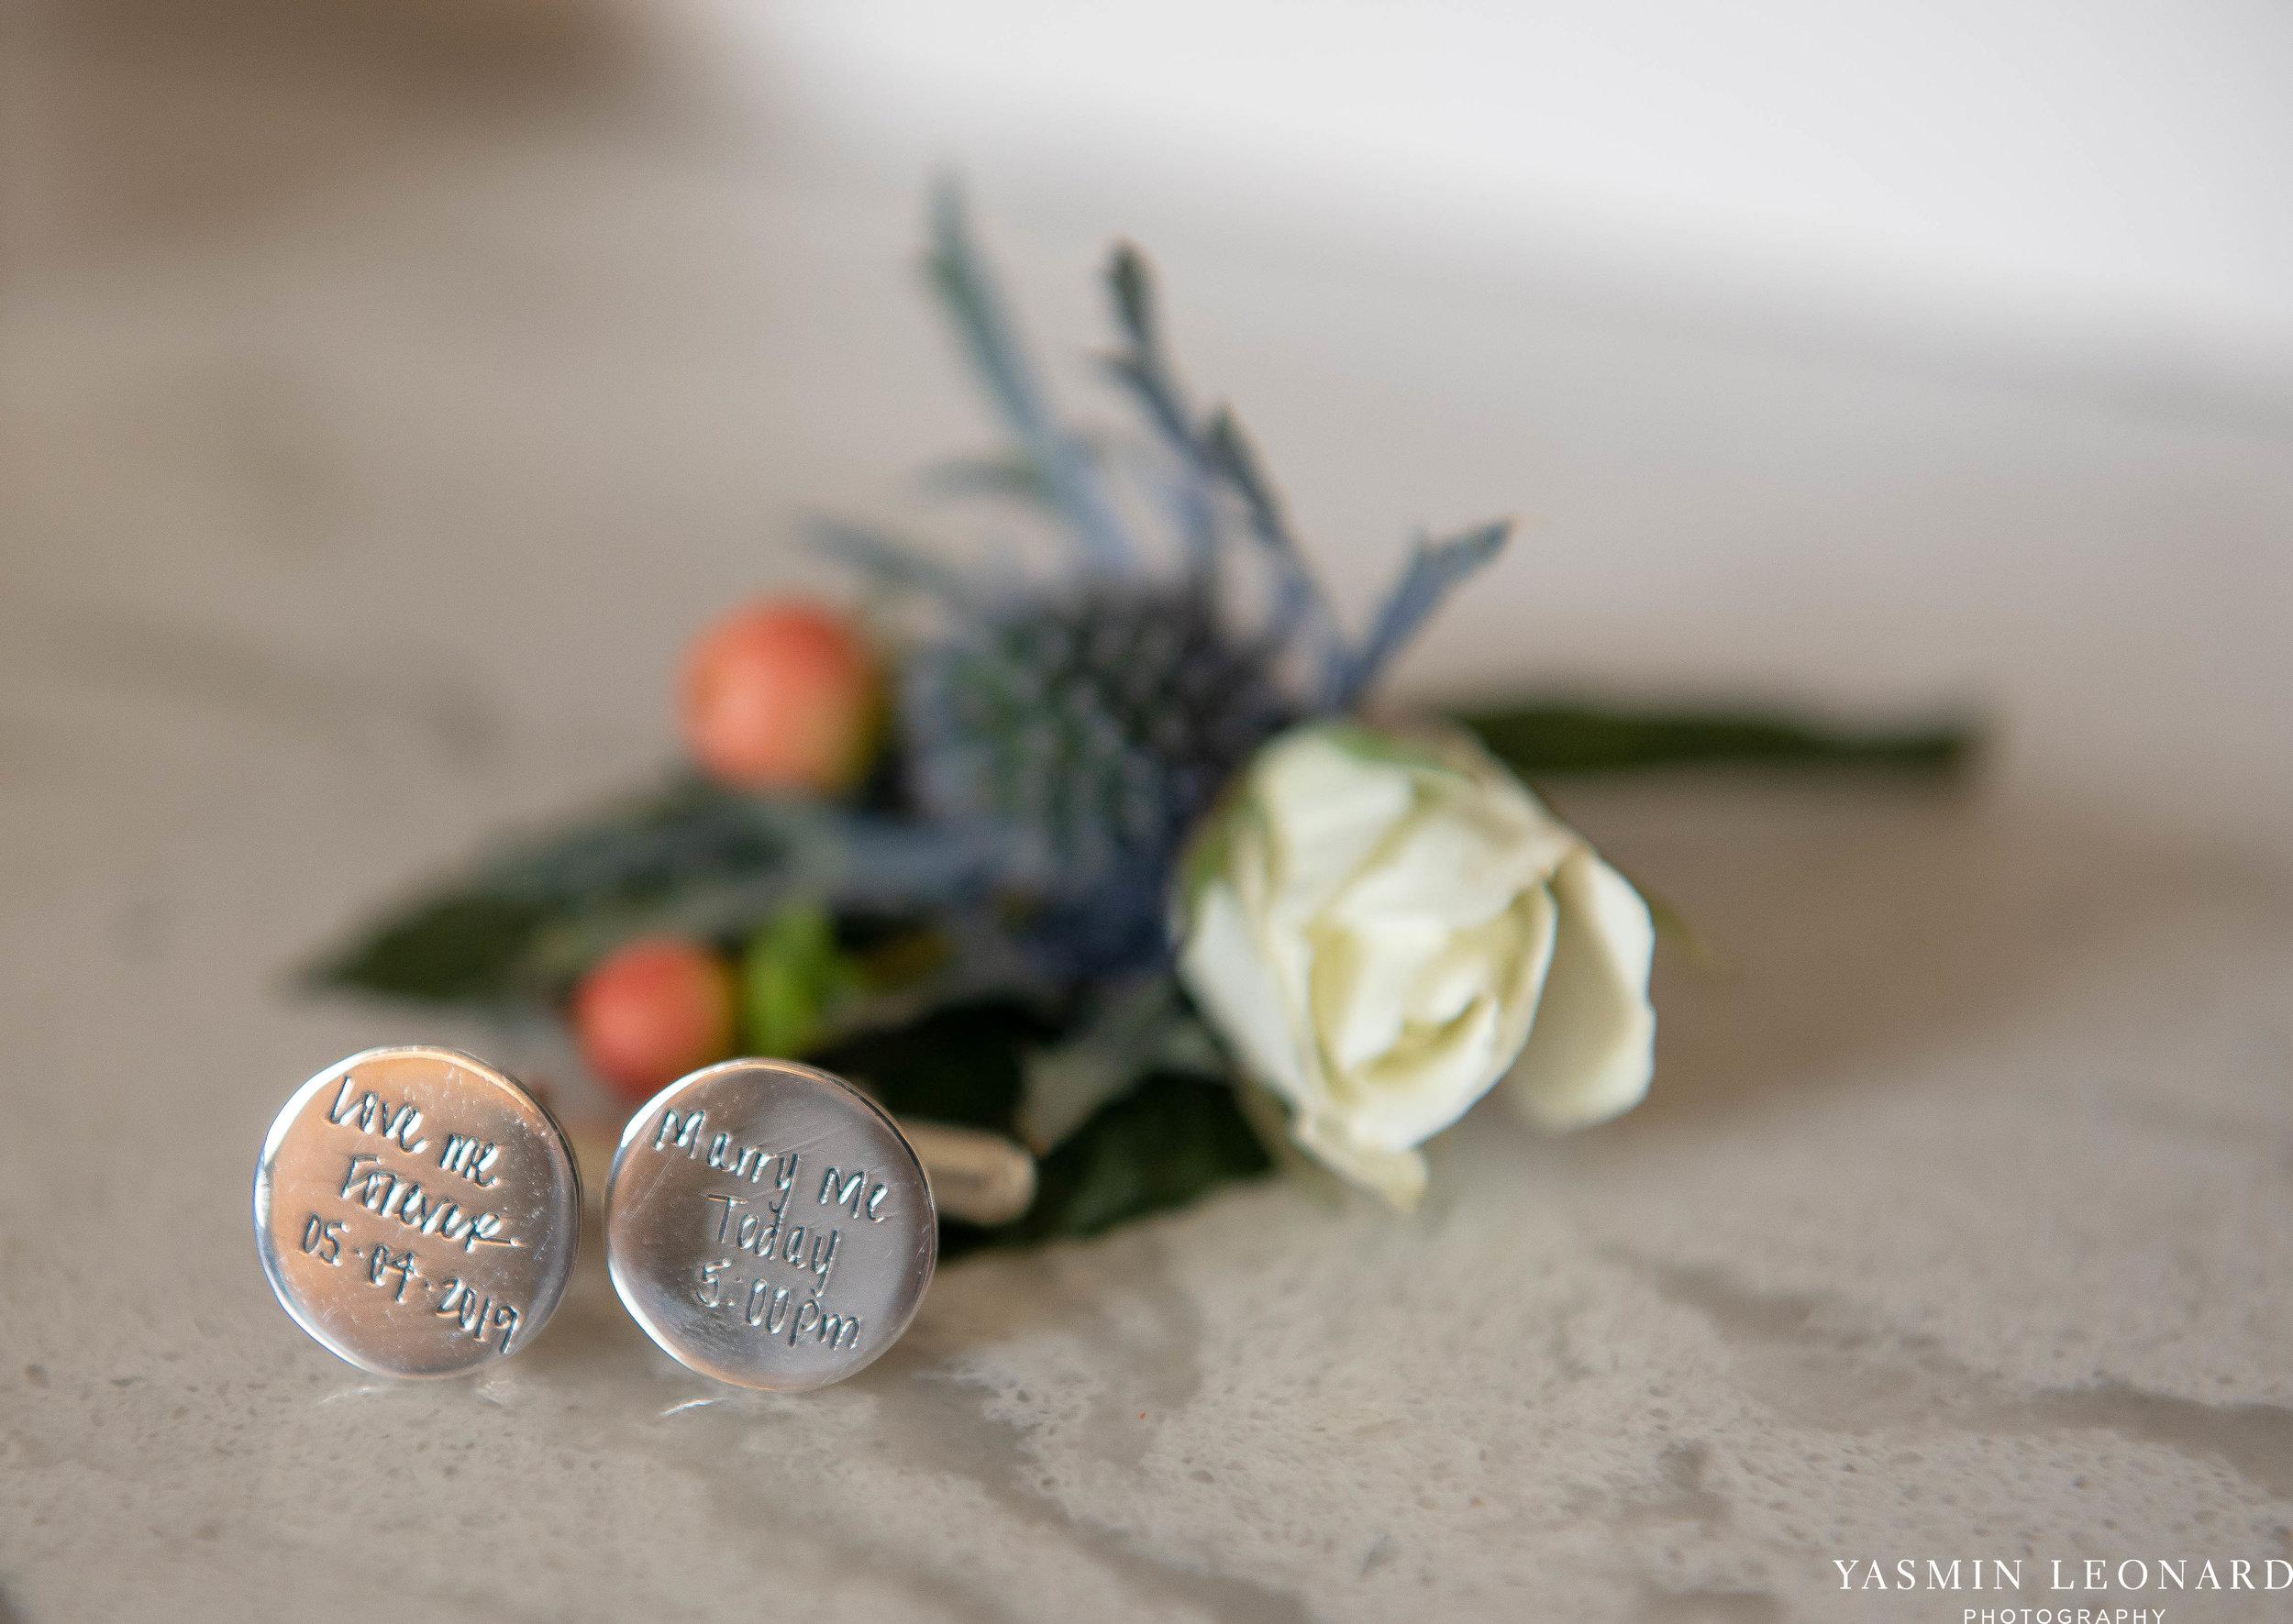 Rain on your wedding day - Rainy Wedding - Plan B for Rain - What to do if it rains on your wedding day - Wedding Inspiration - Outdoor wedding ideas - Rainy Wedding Pictures - Yasmin Leonard Photography-5.jpg